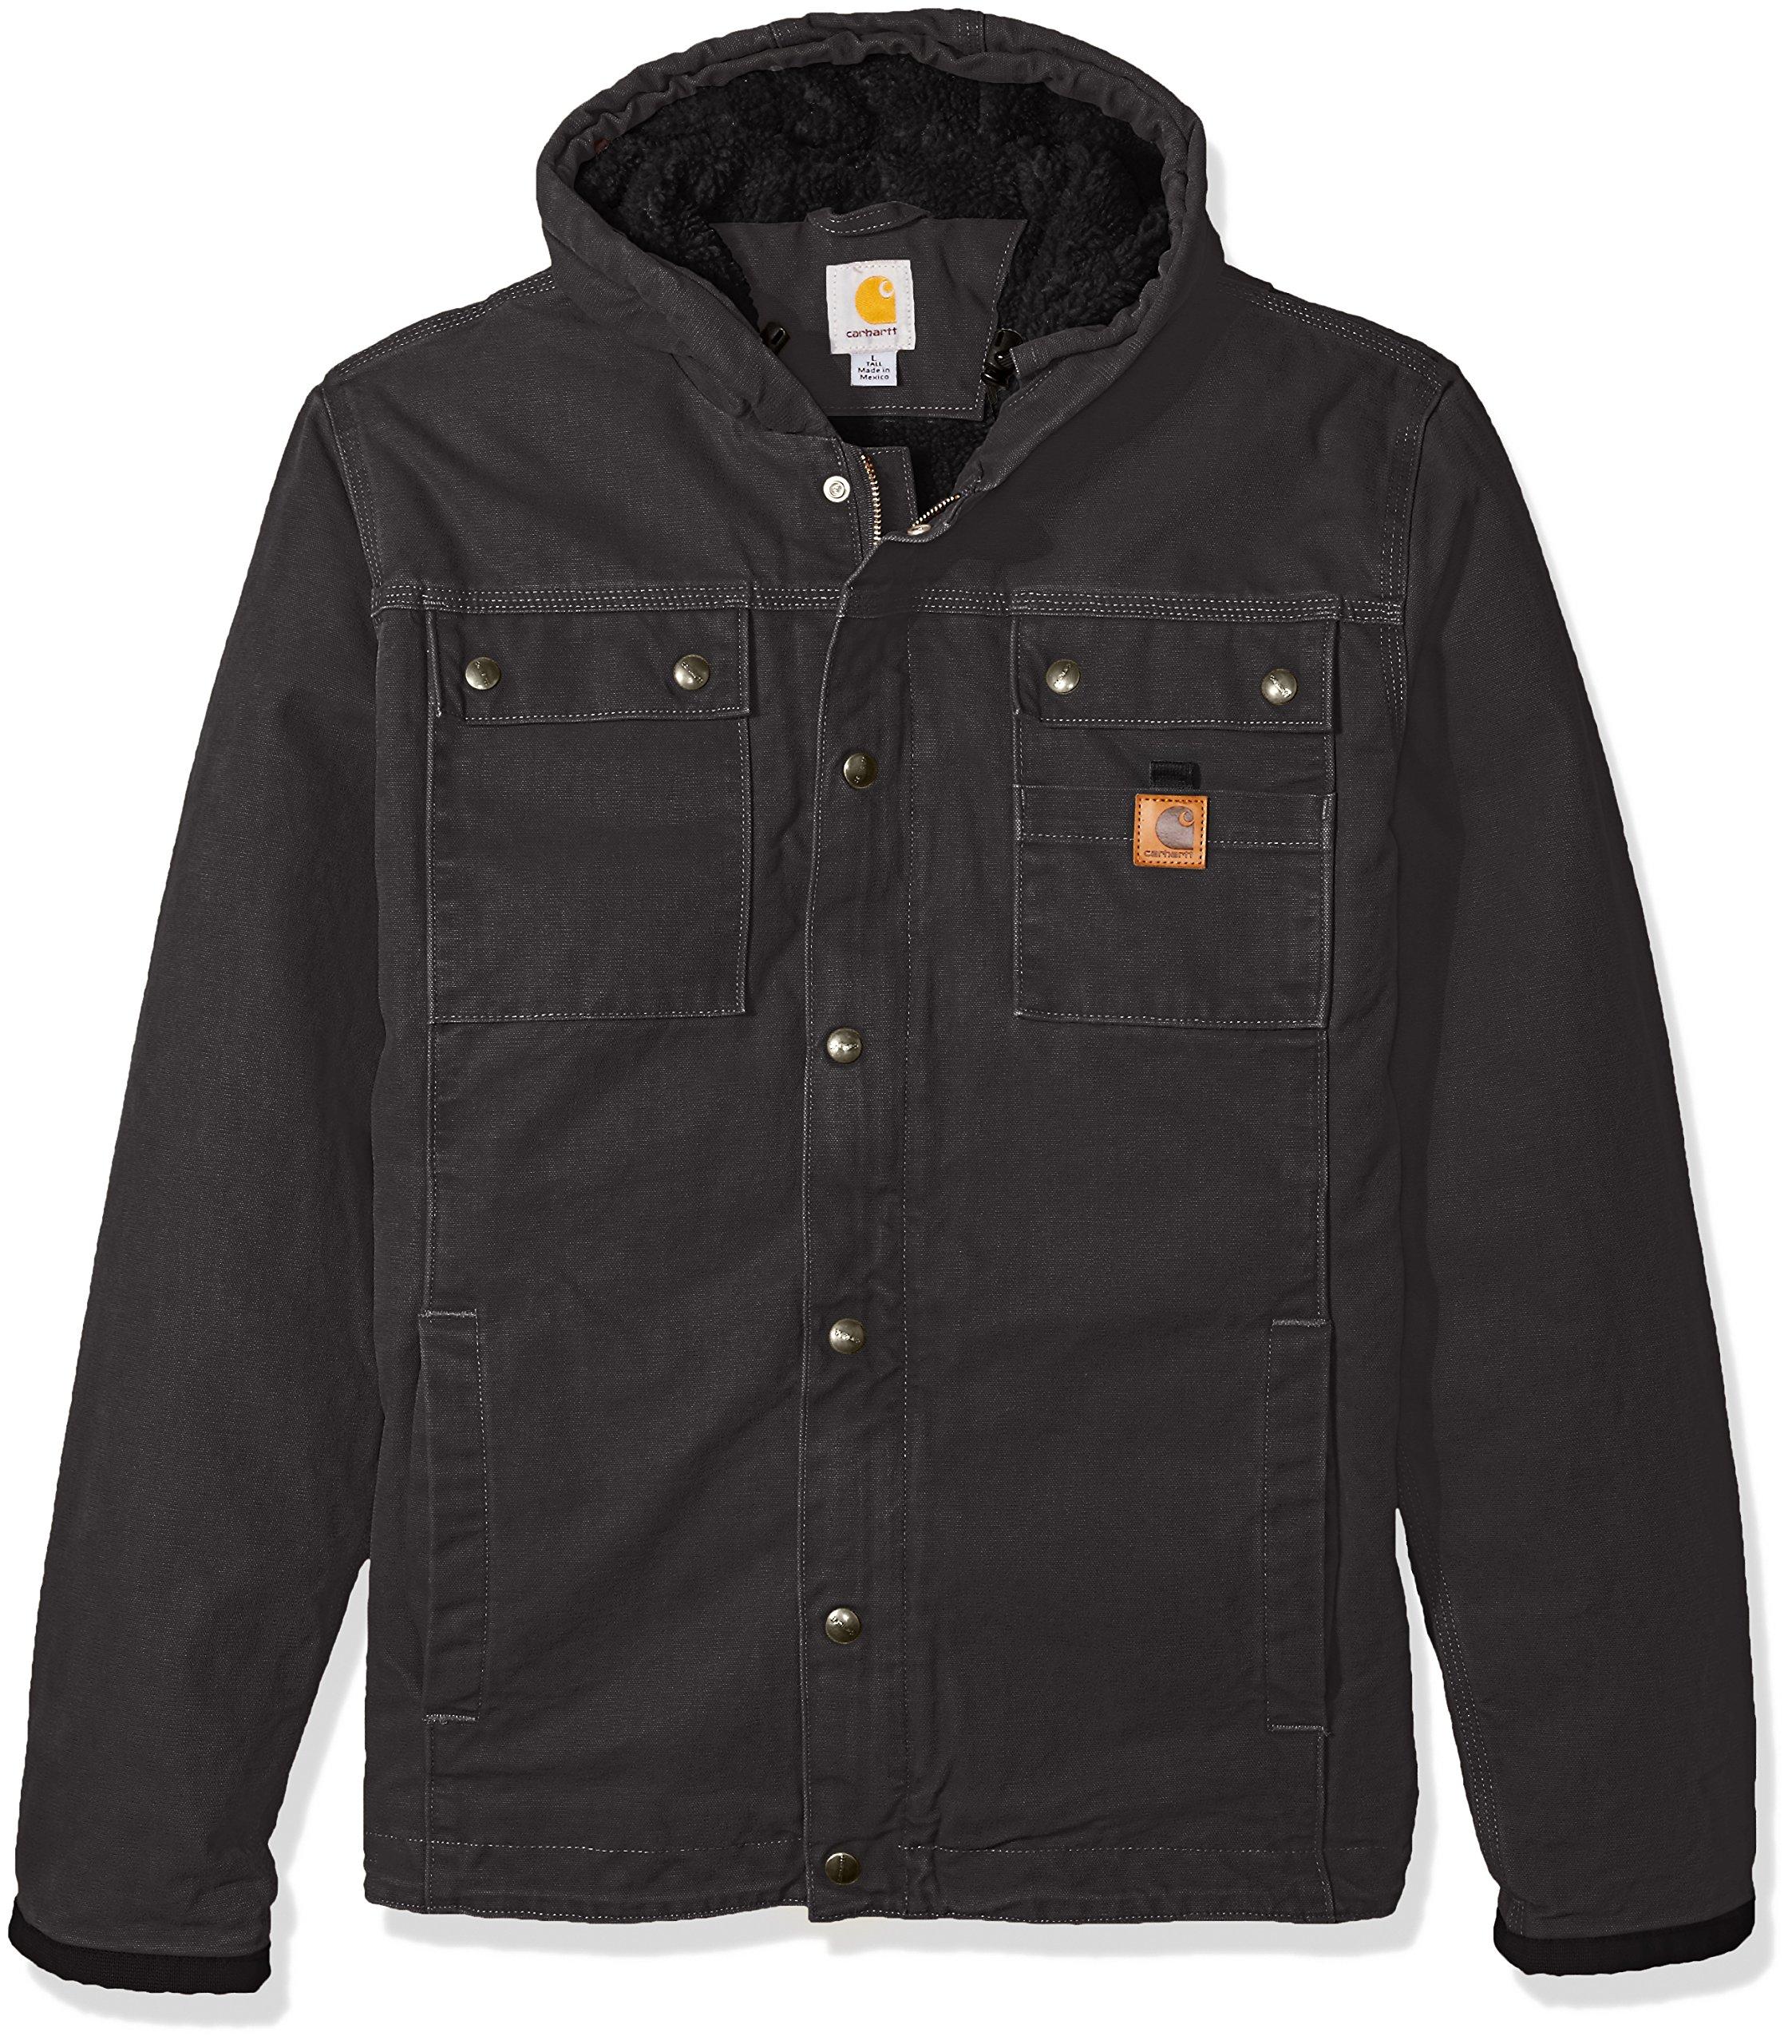 Carhartt Men's Big & Tall Bartlett Jacket, Gravel, 4X-Large by Carhartt (Image #1)